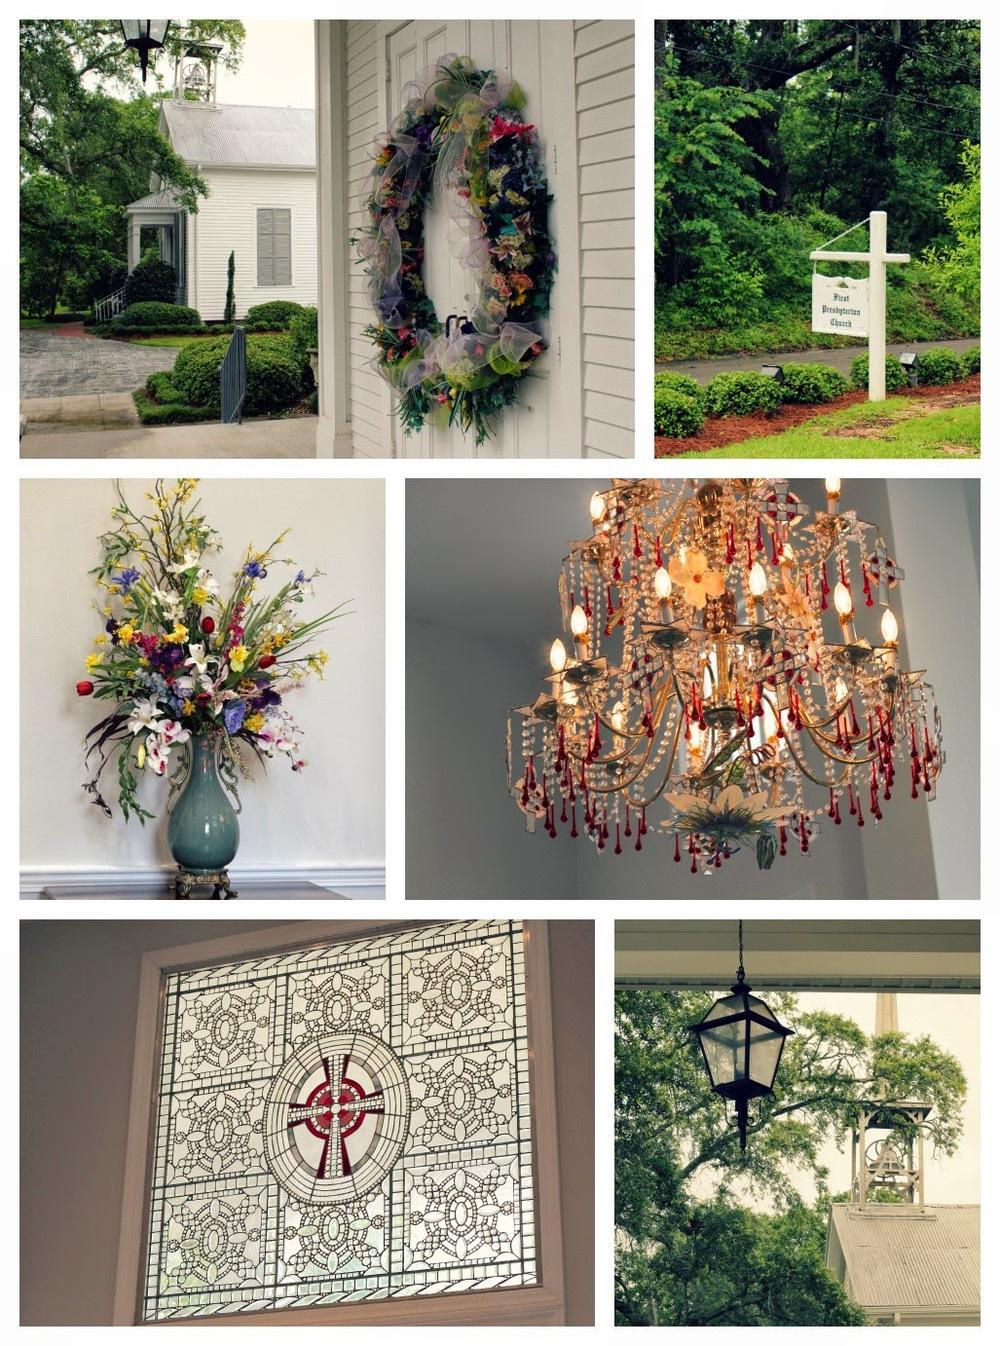 Lilly+Wedding+collage14.jpg